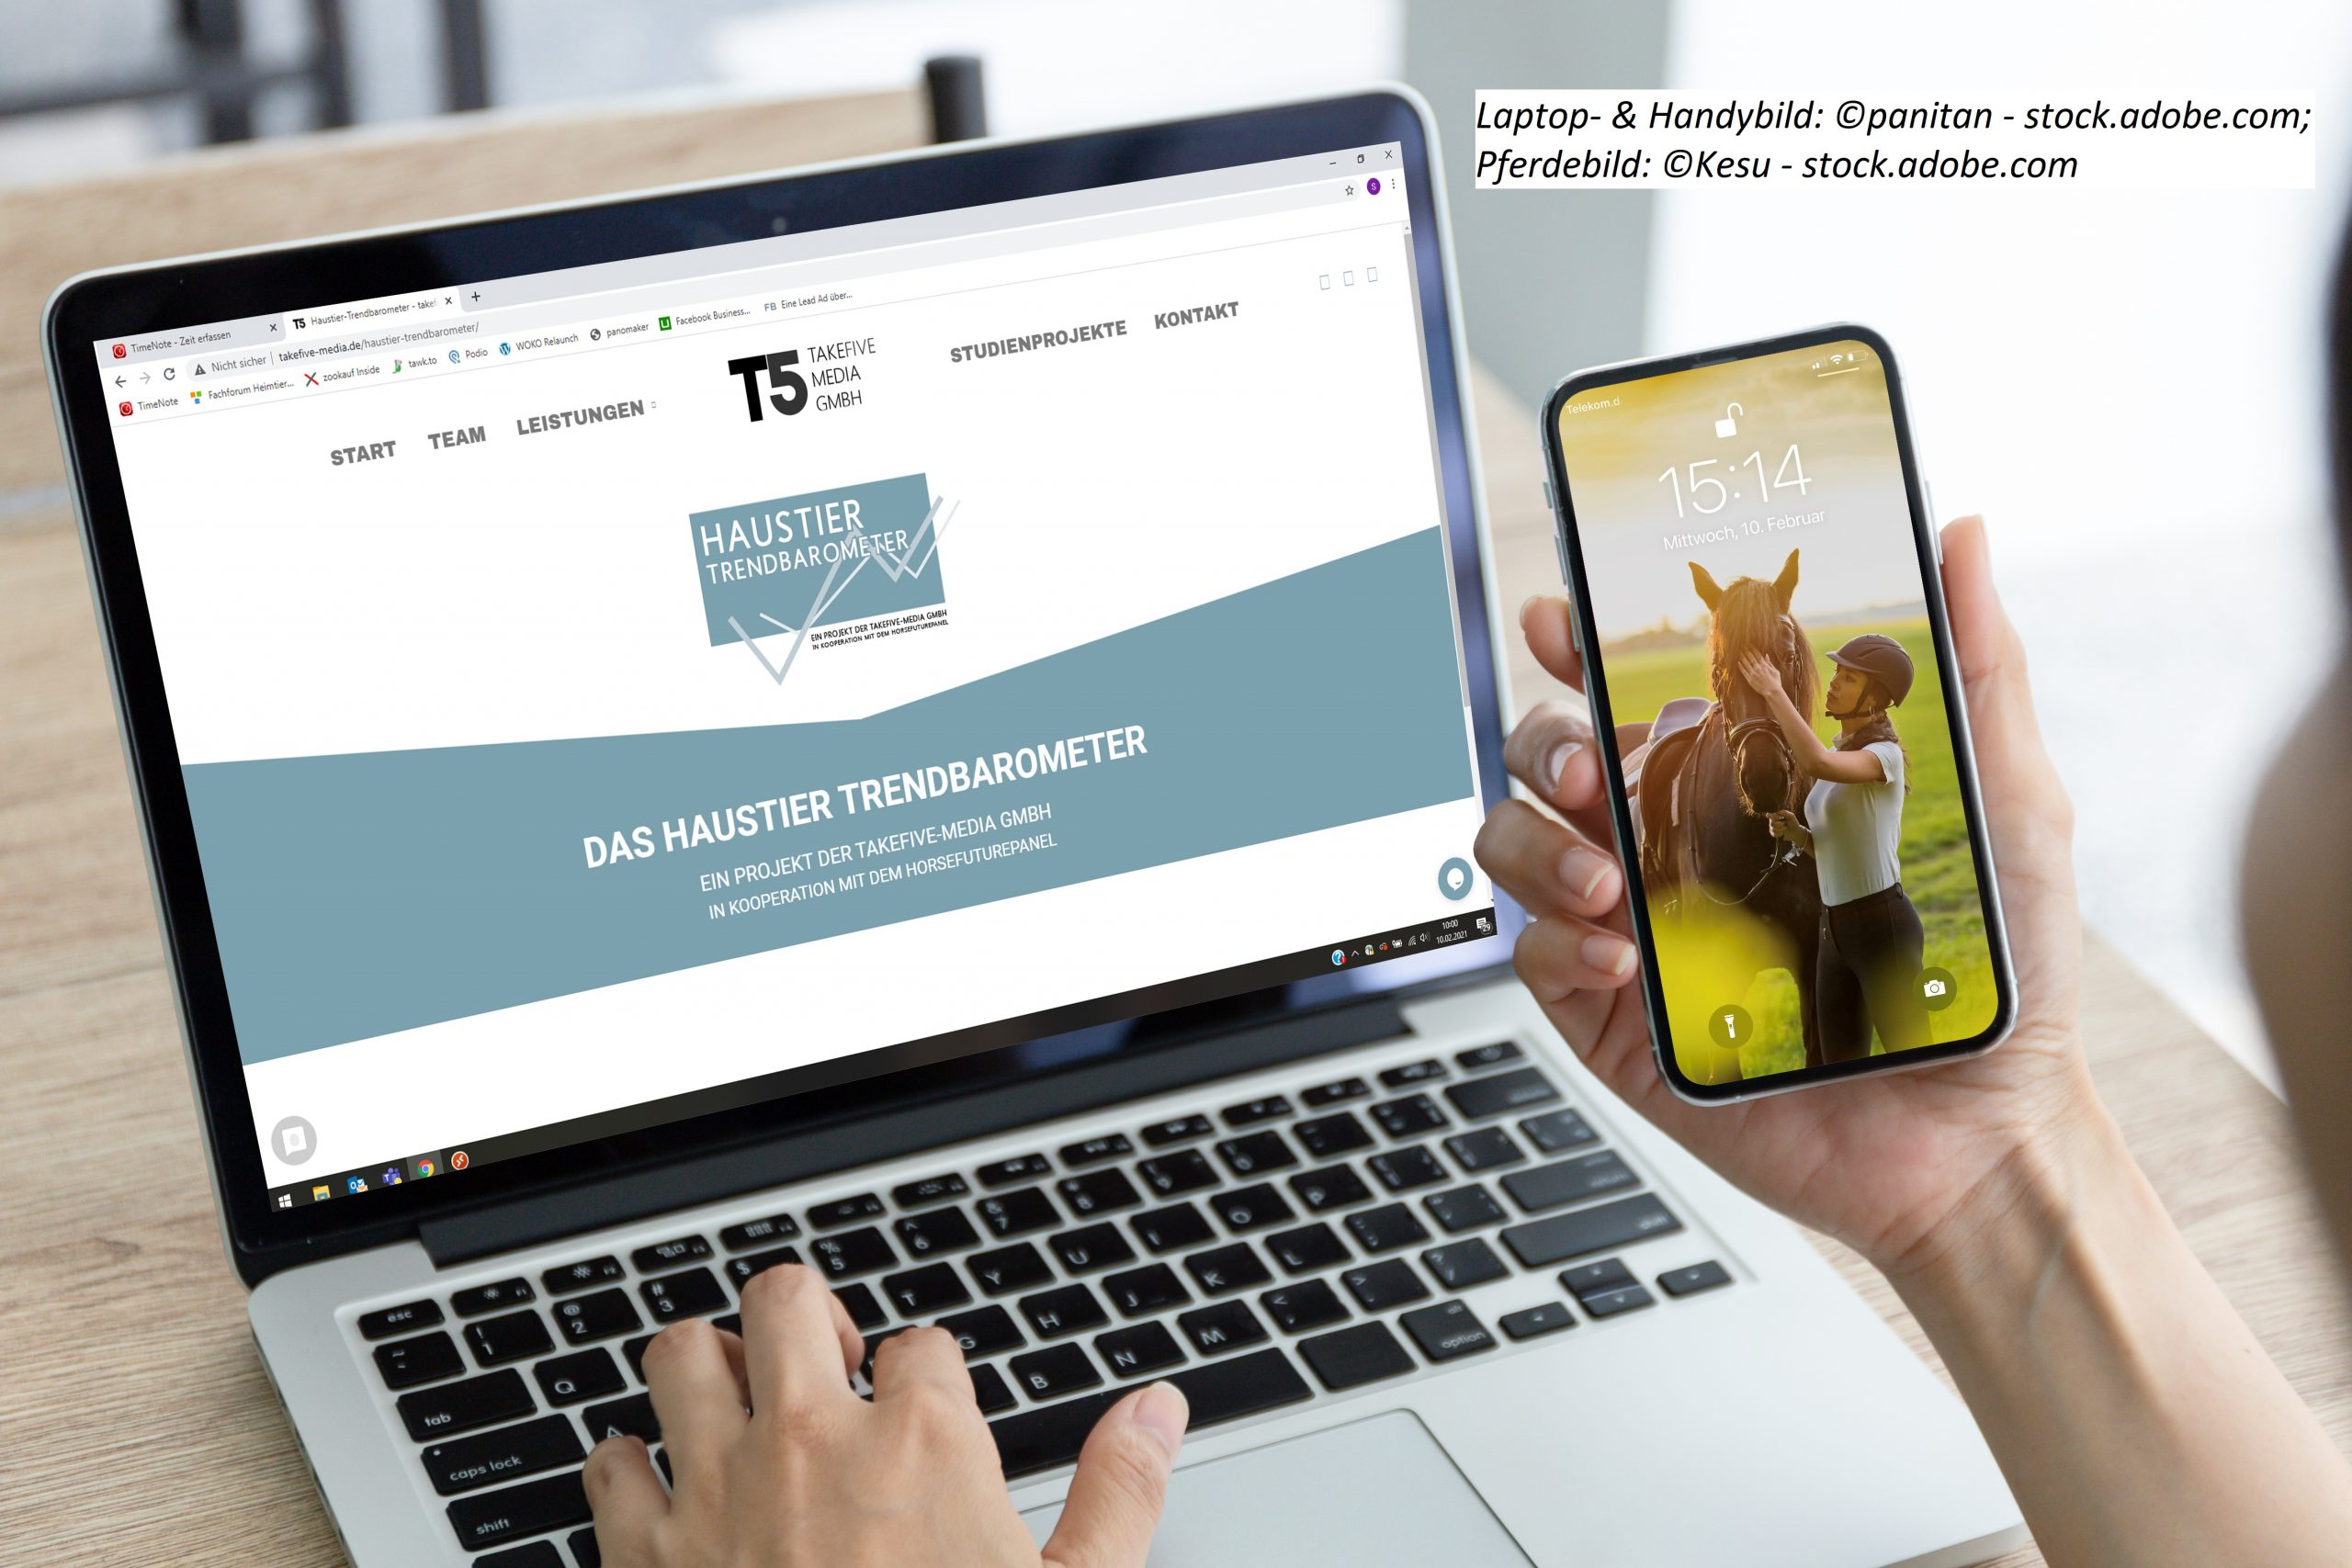 AdobeStock_315388736; Laptop- und Handybild panitan, stock.adobe.com, Pferdebild Kesu, stock.adobe.com